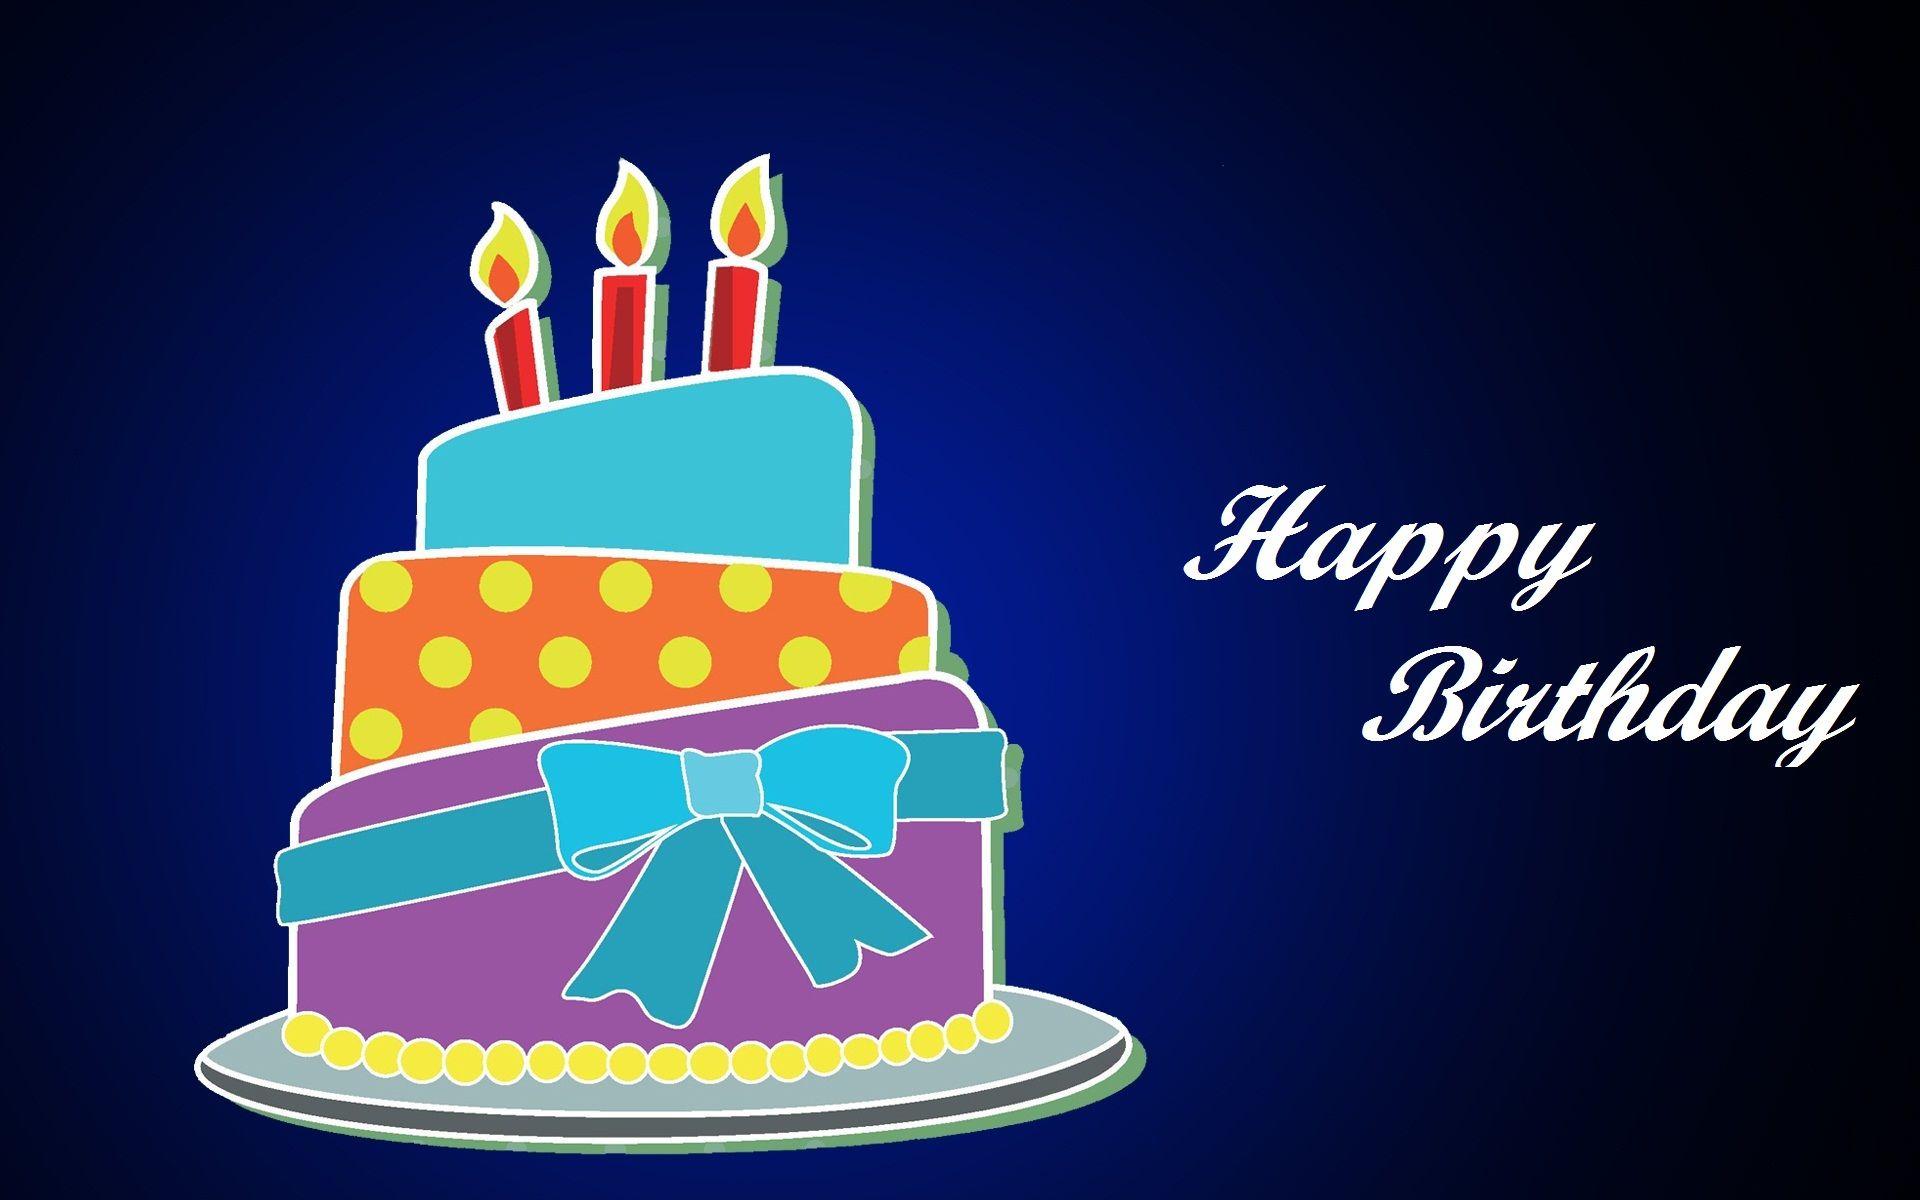 Blue Happy Birthday Wallpaper Free Download Hd Desktop Wallpapers 1080p Happy Birthday Wallpaper Happy Birthday Cards Diy Birthday Gifts For Him